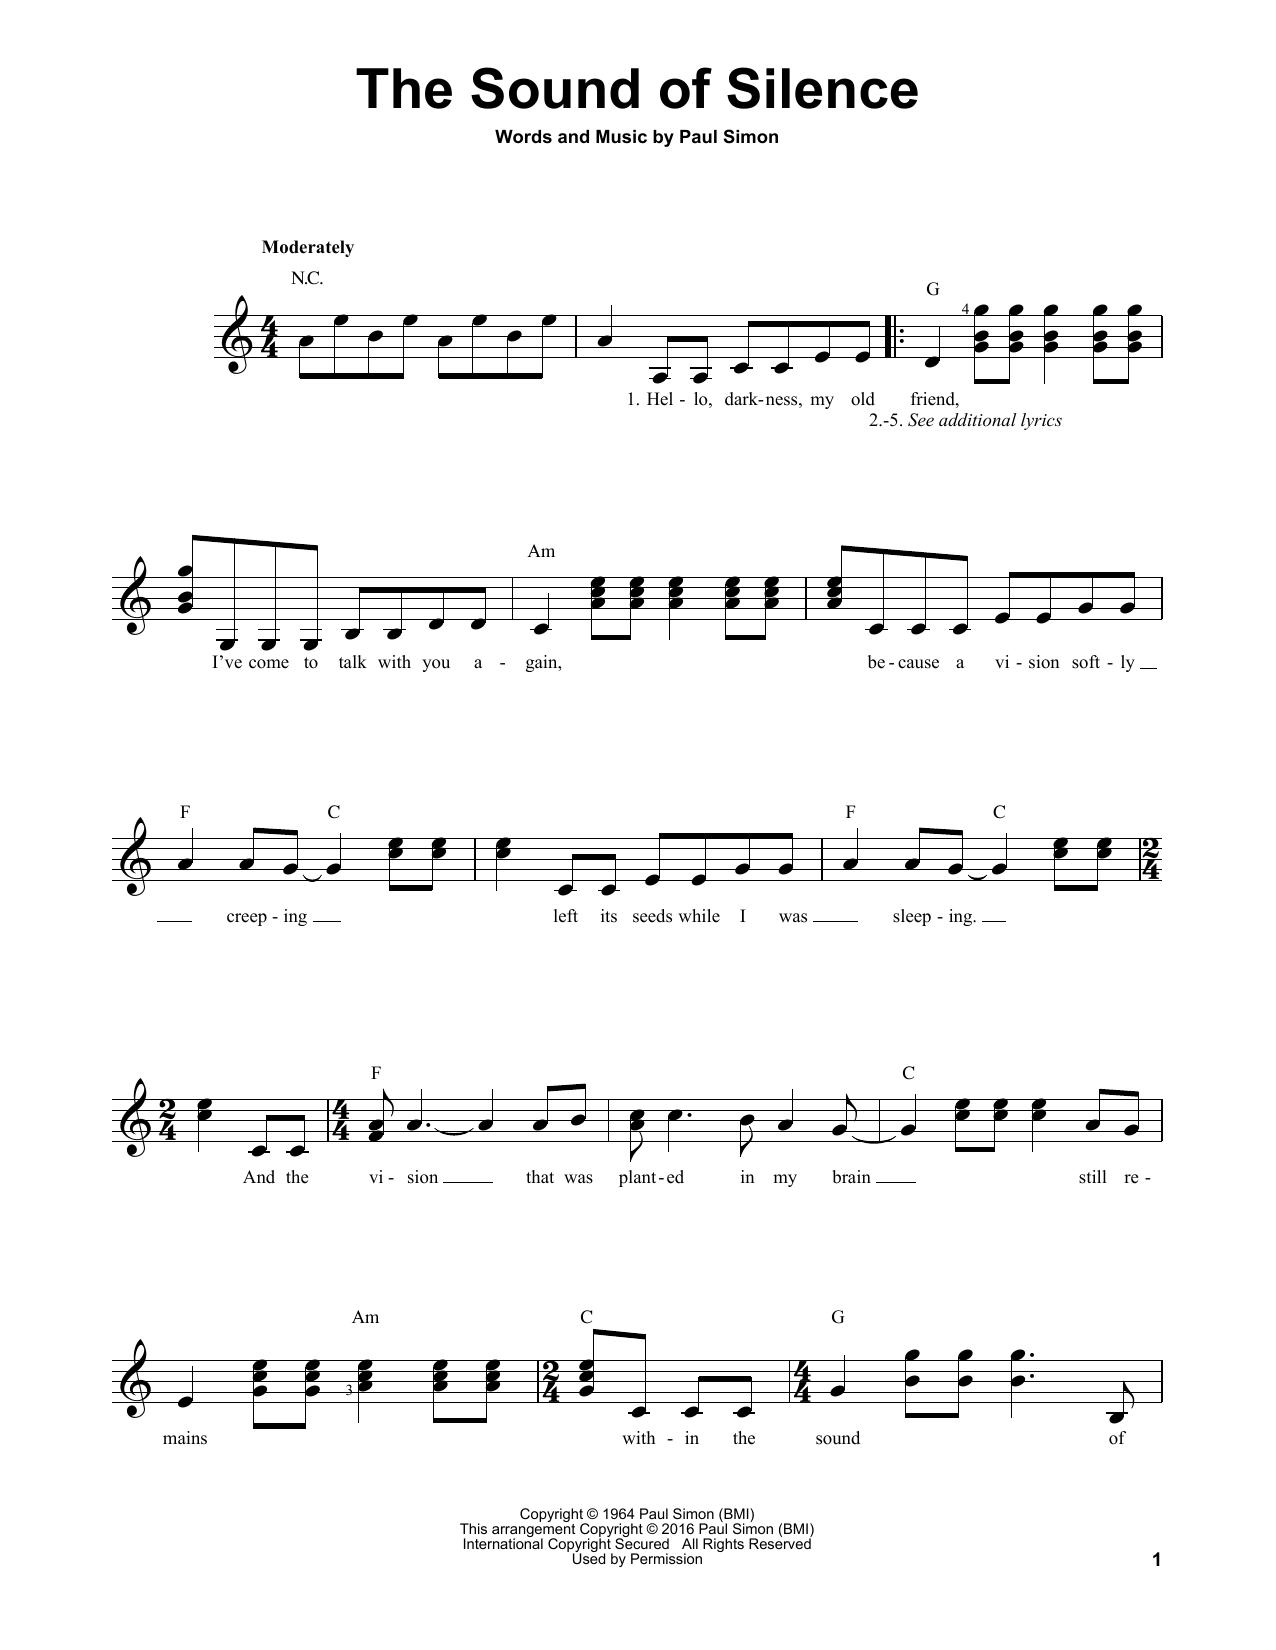 Simon Garfunkel The Sound Of Silence Sheet Music Notes Chords